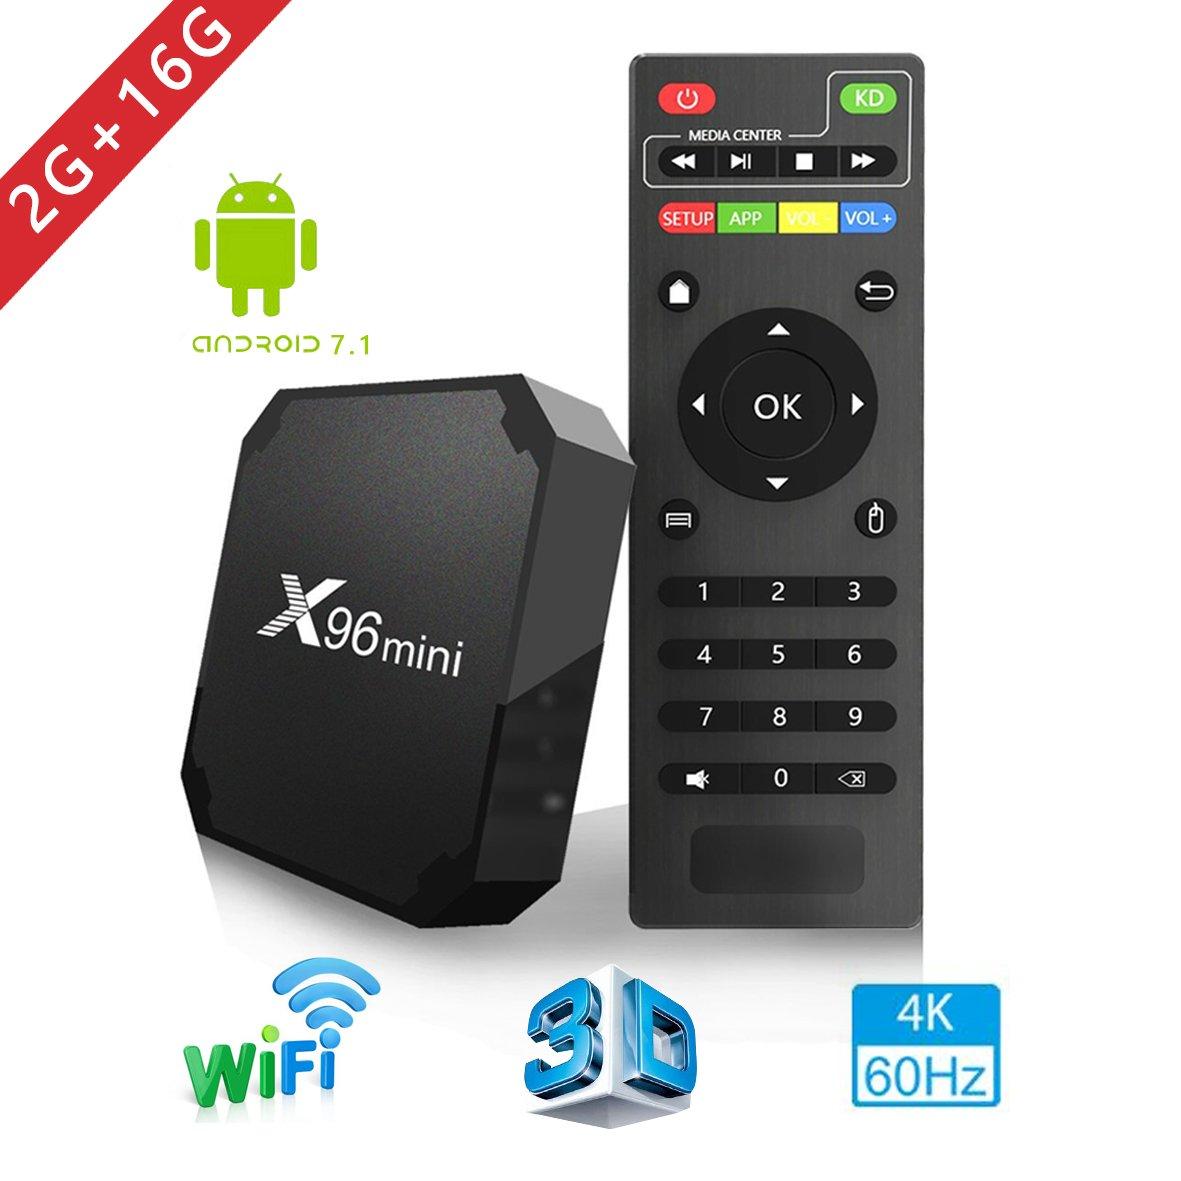 2018 Android TV Box - Smart TV Box with Quad Core X96 Mini Android 7.1 OS Amlogic S905W 3D/4K/HD Media Player 2GB 16GB/WiFi 2.4G X96 Mini TV Box